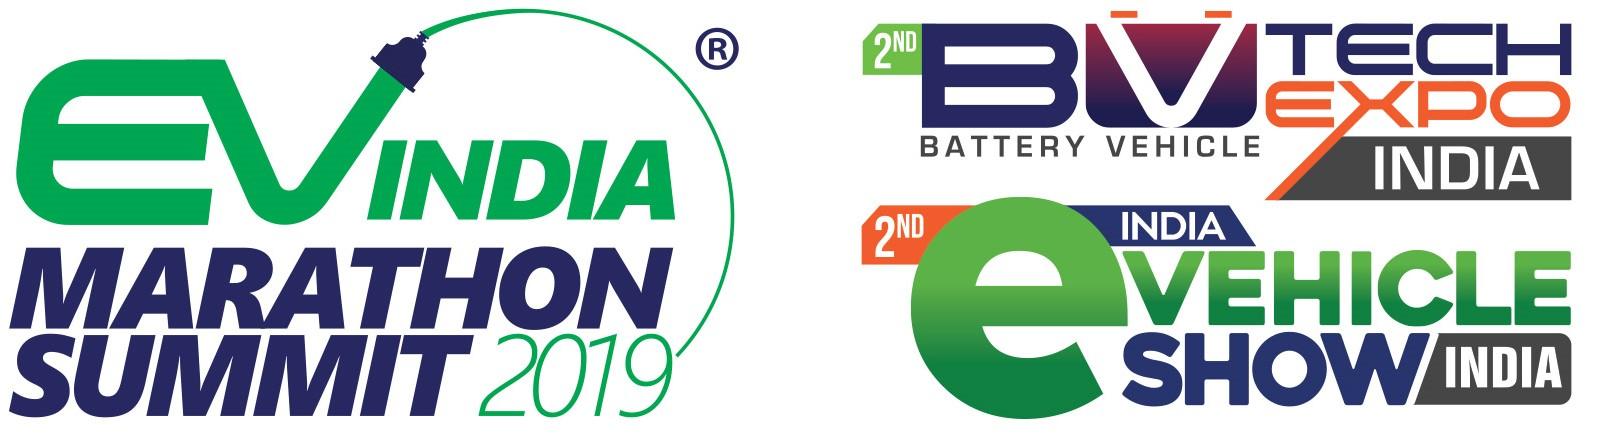 The India E-Vehicle Show & BV TECH EXPO INDIA